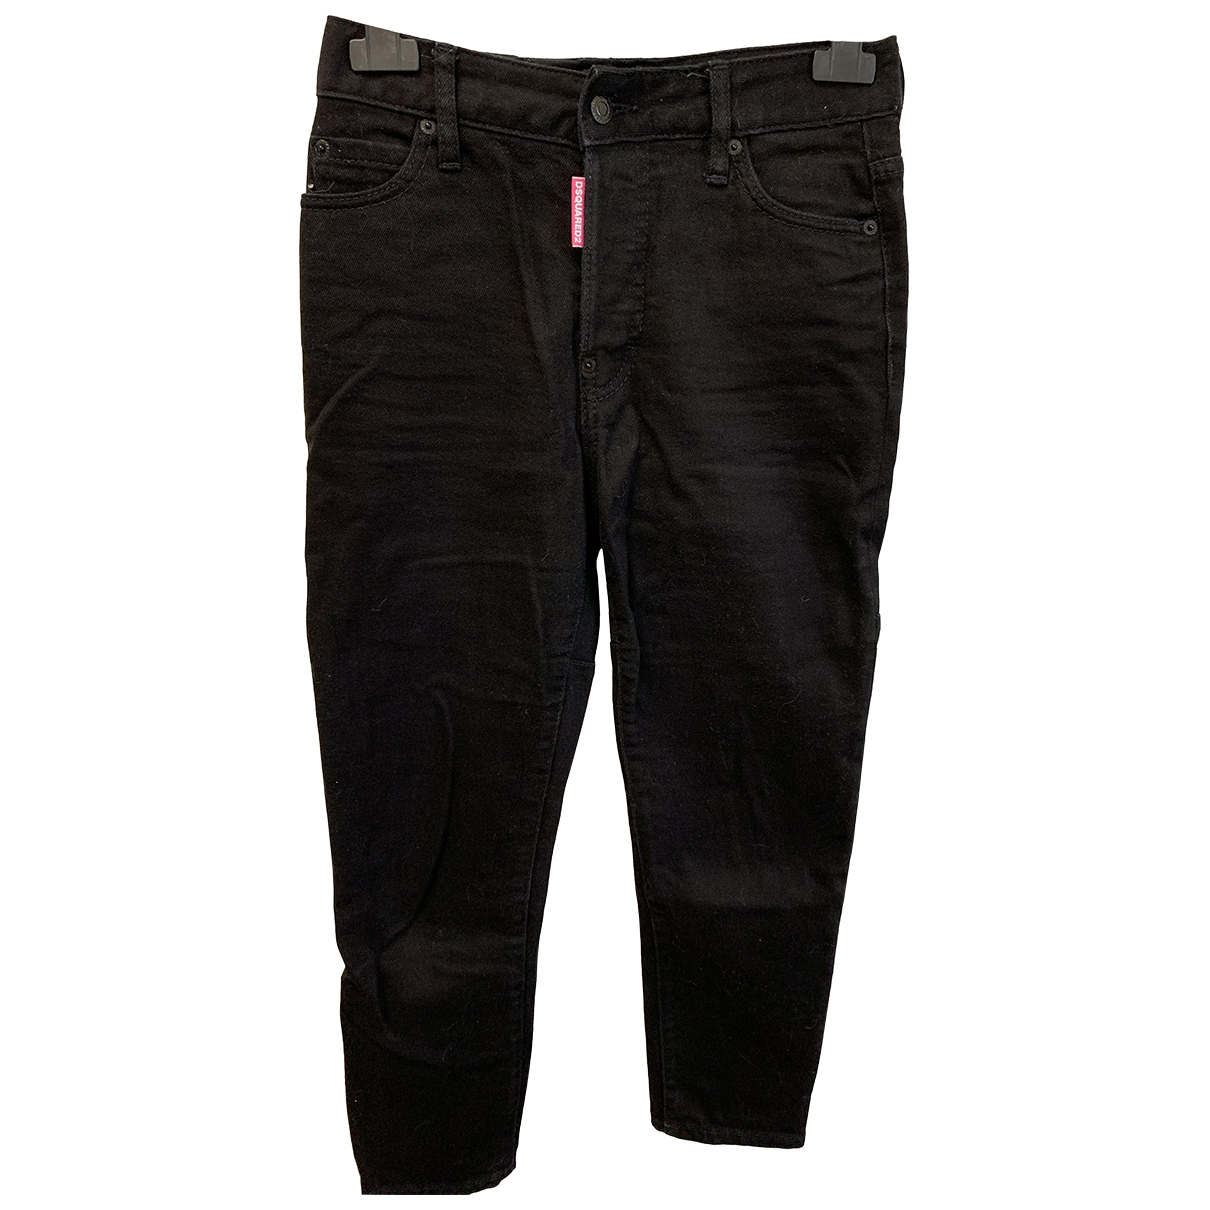 Dsquared2 N Black Cotton - elasthane Jeans for Women 40 FR